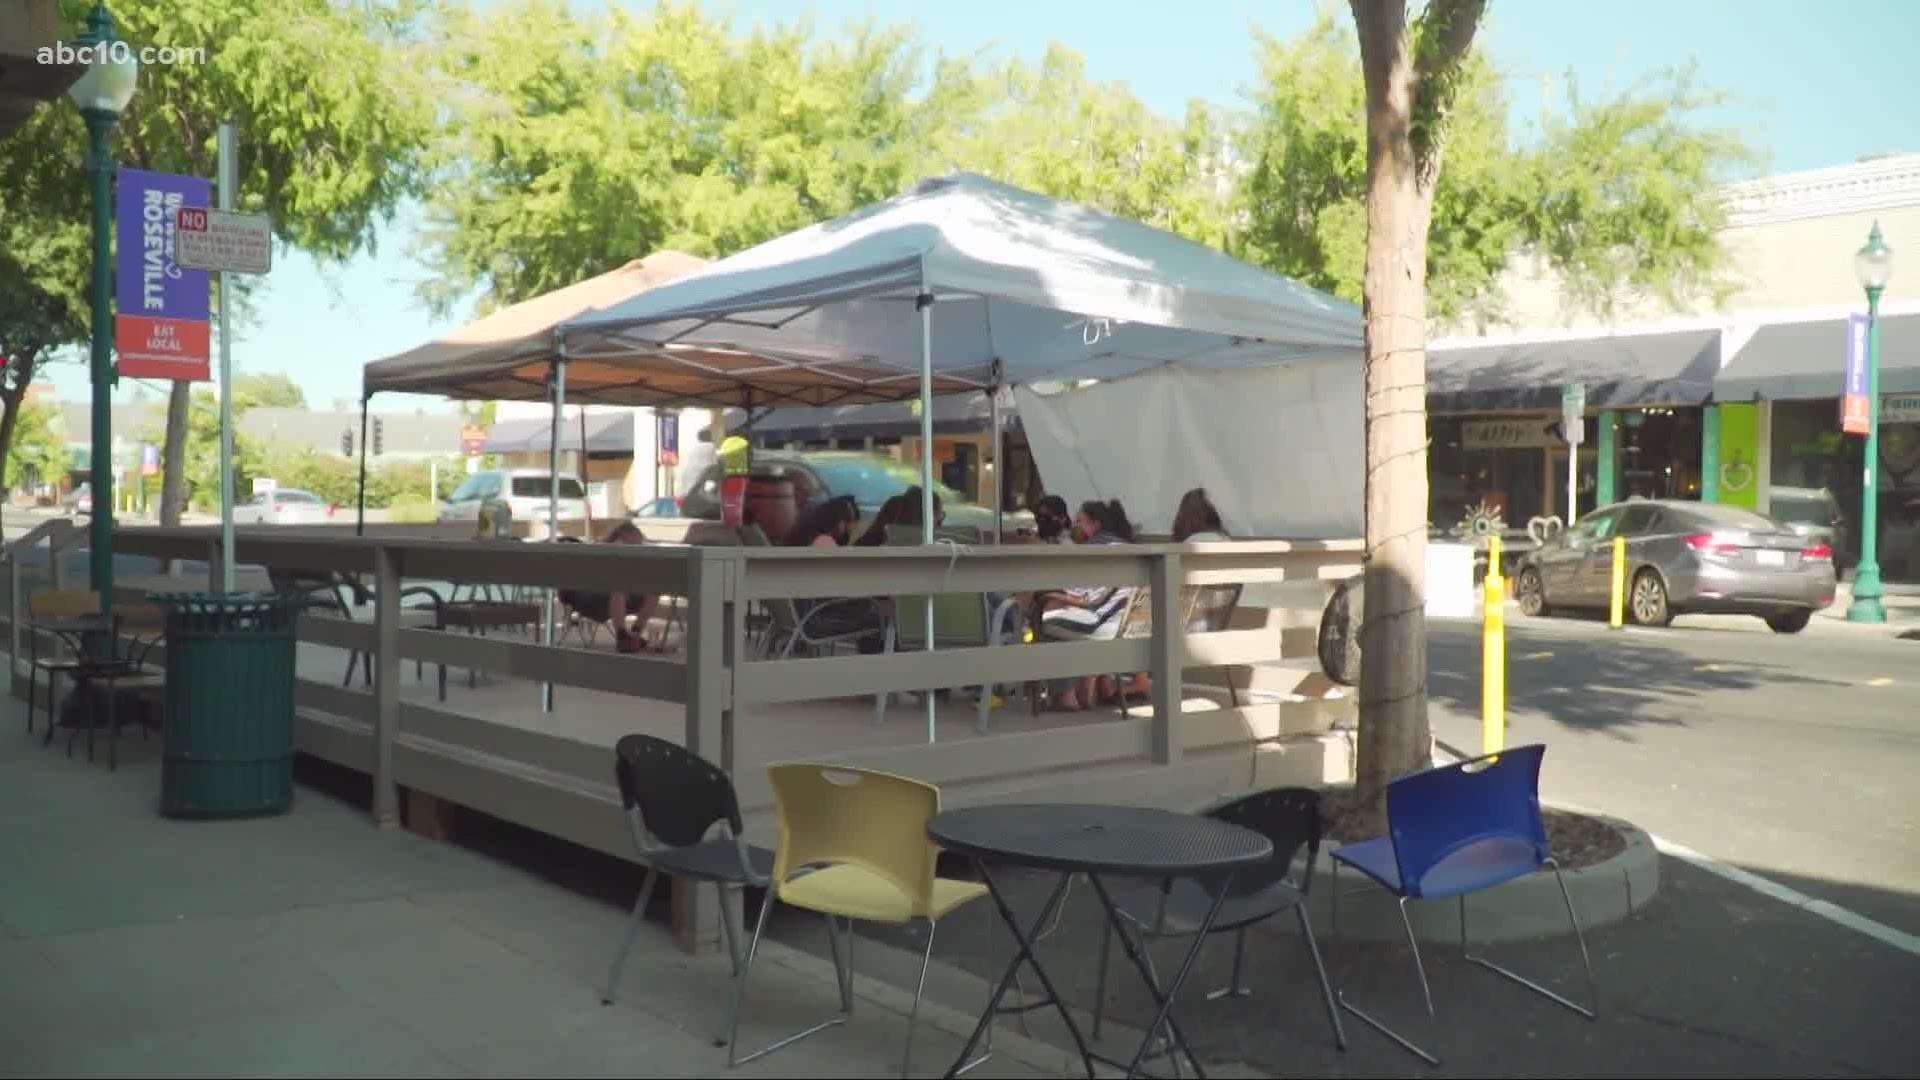 Restaurants Open Christmas 2020, Roseville Ca Roseville builds patio decks to help businesses stay open | abc10.com